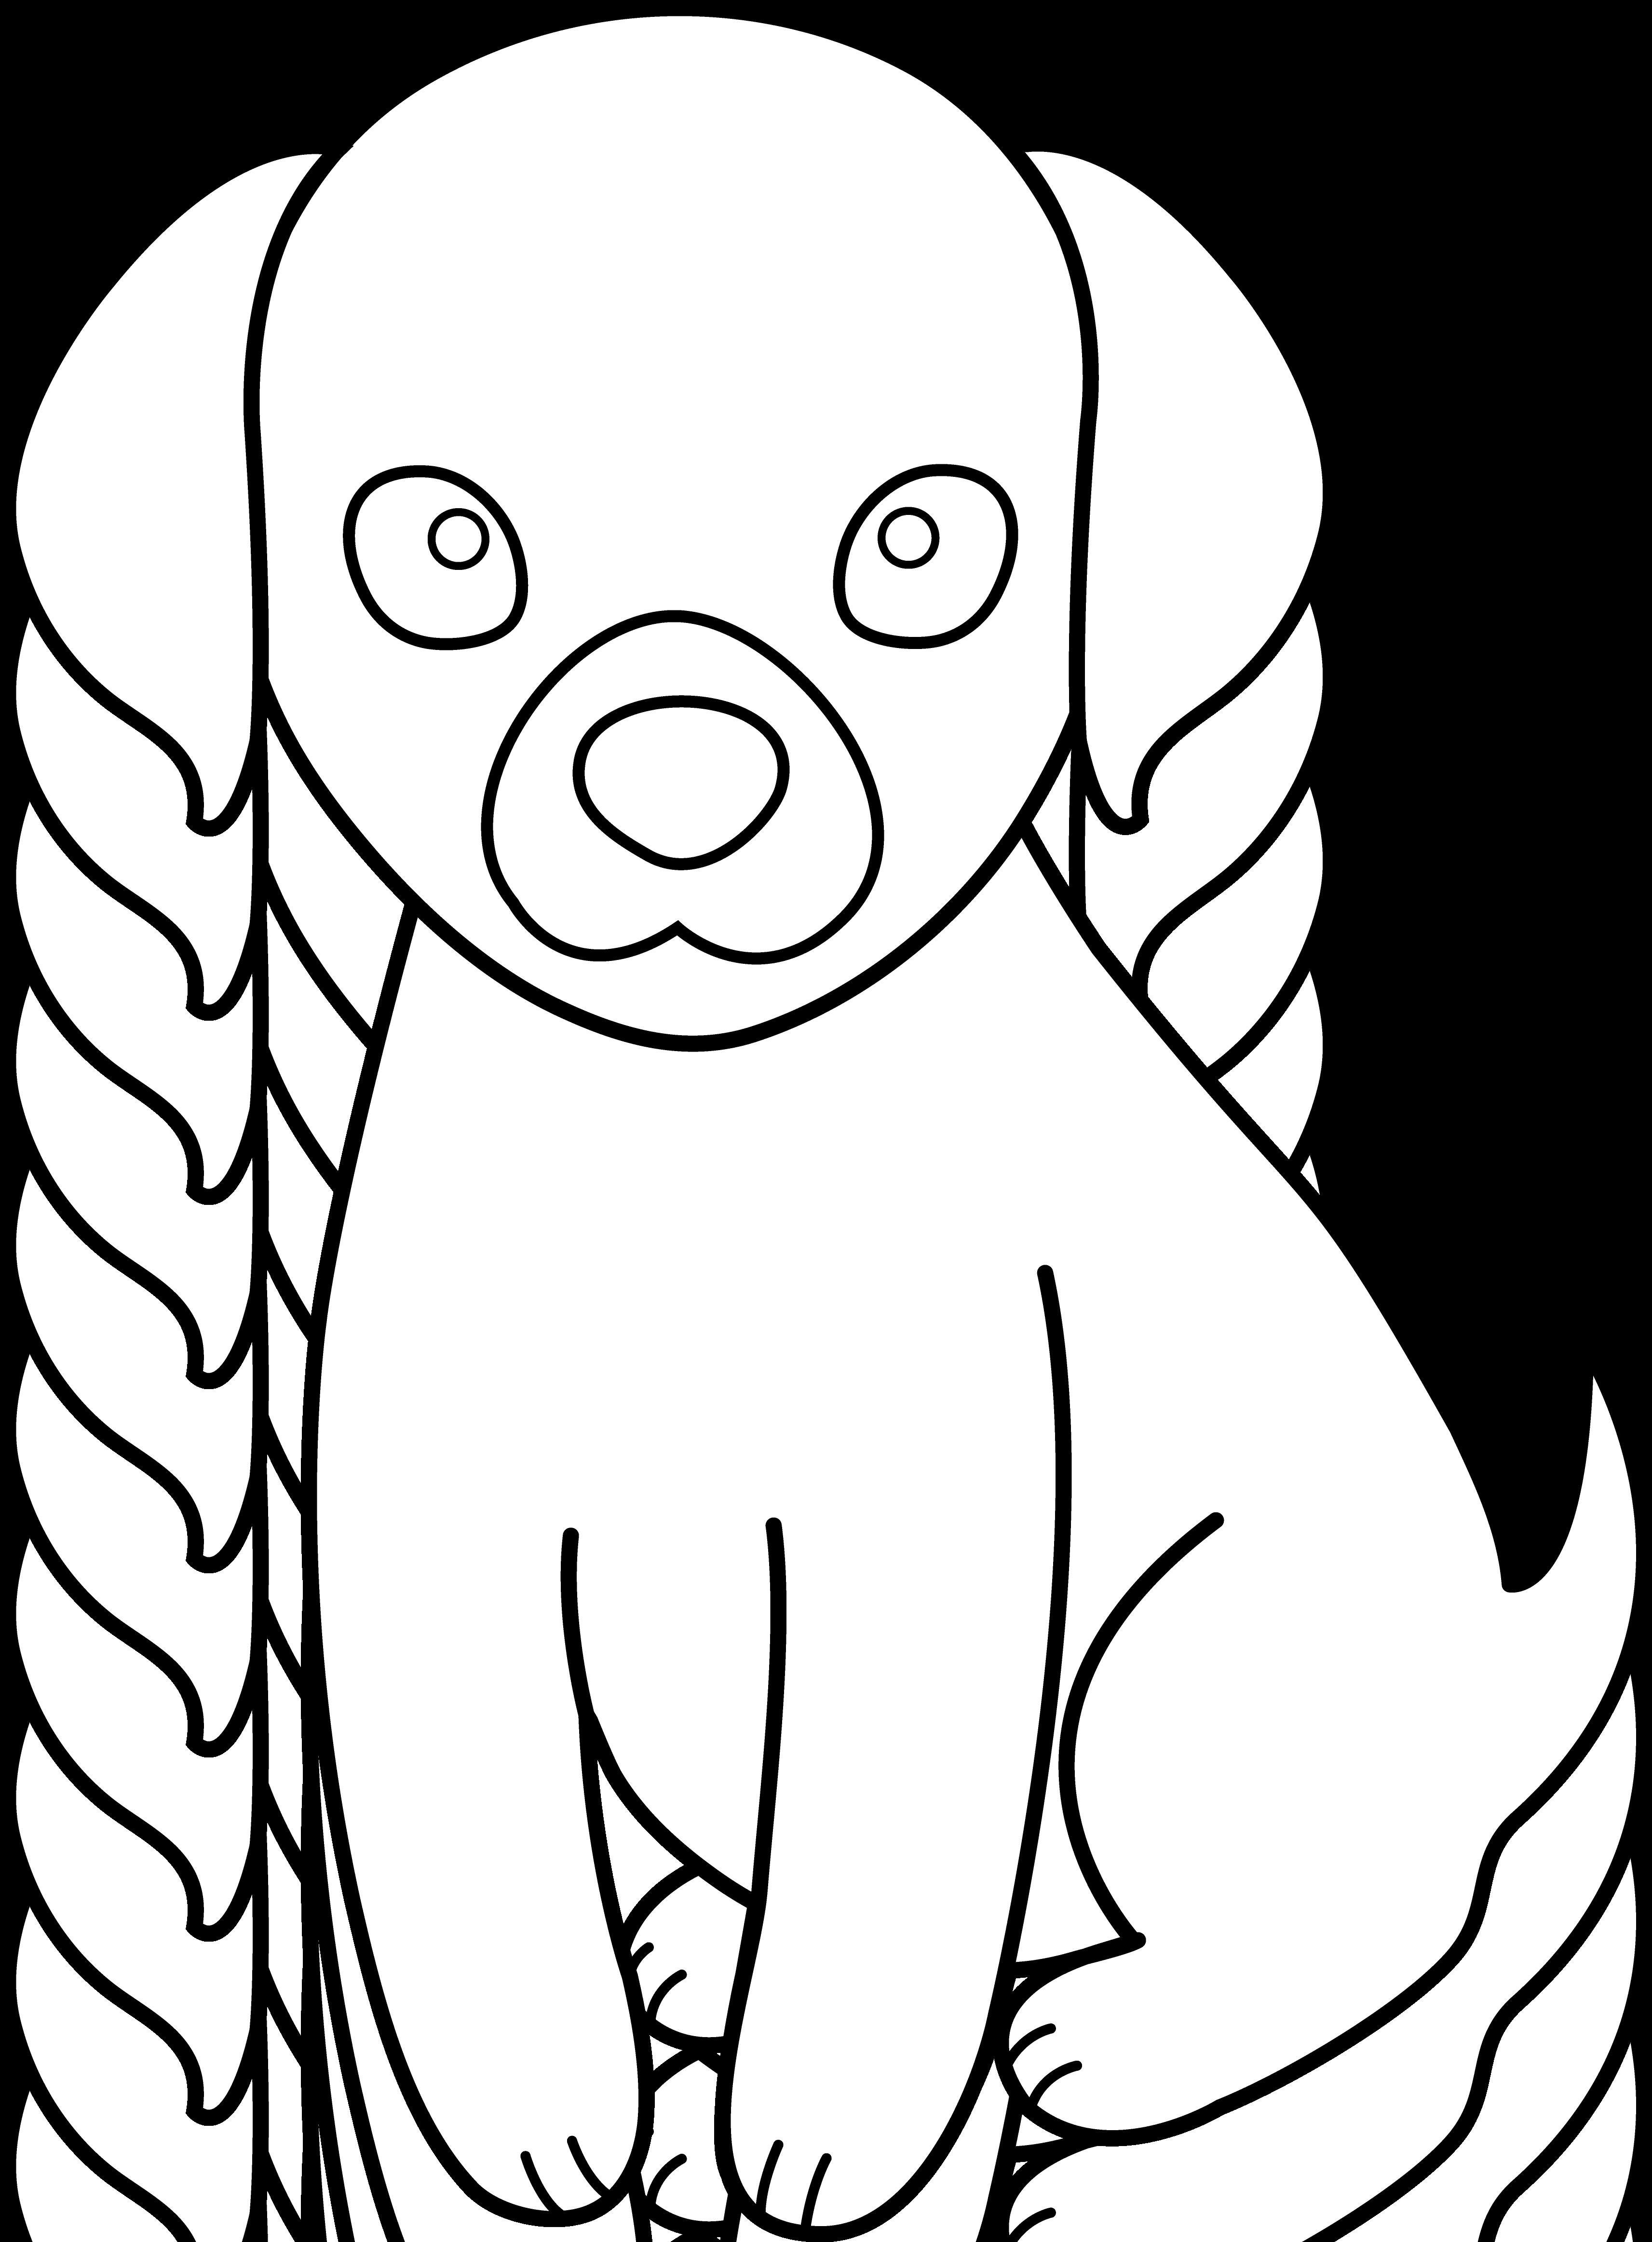 Blush Cute Dog Drawing Clipart Panda Free Clipart Images